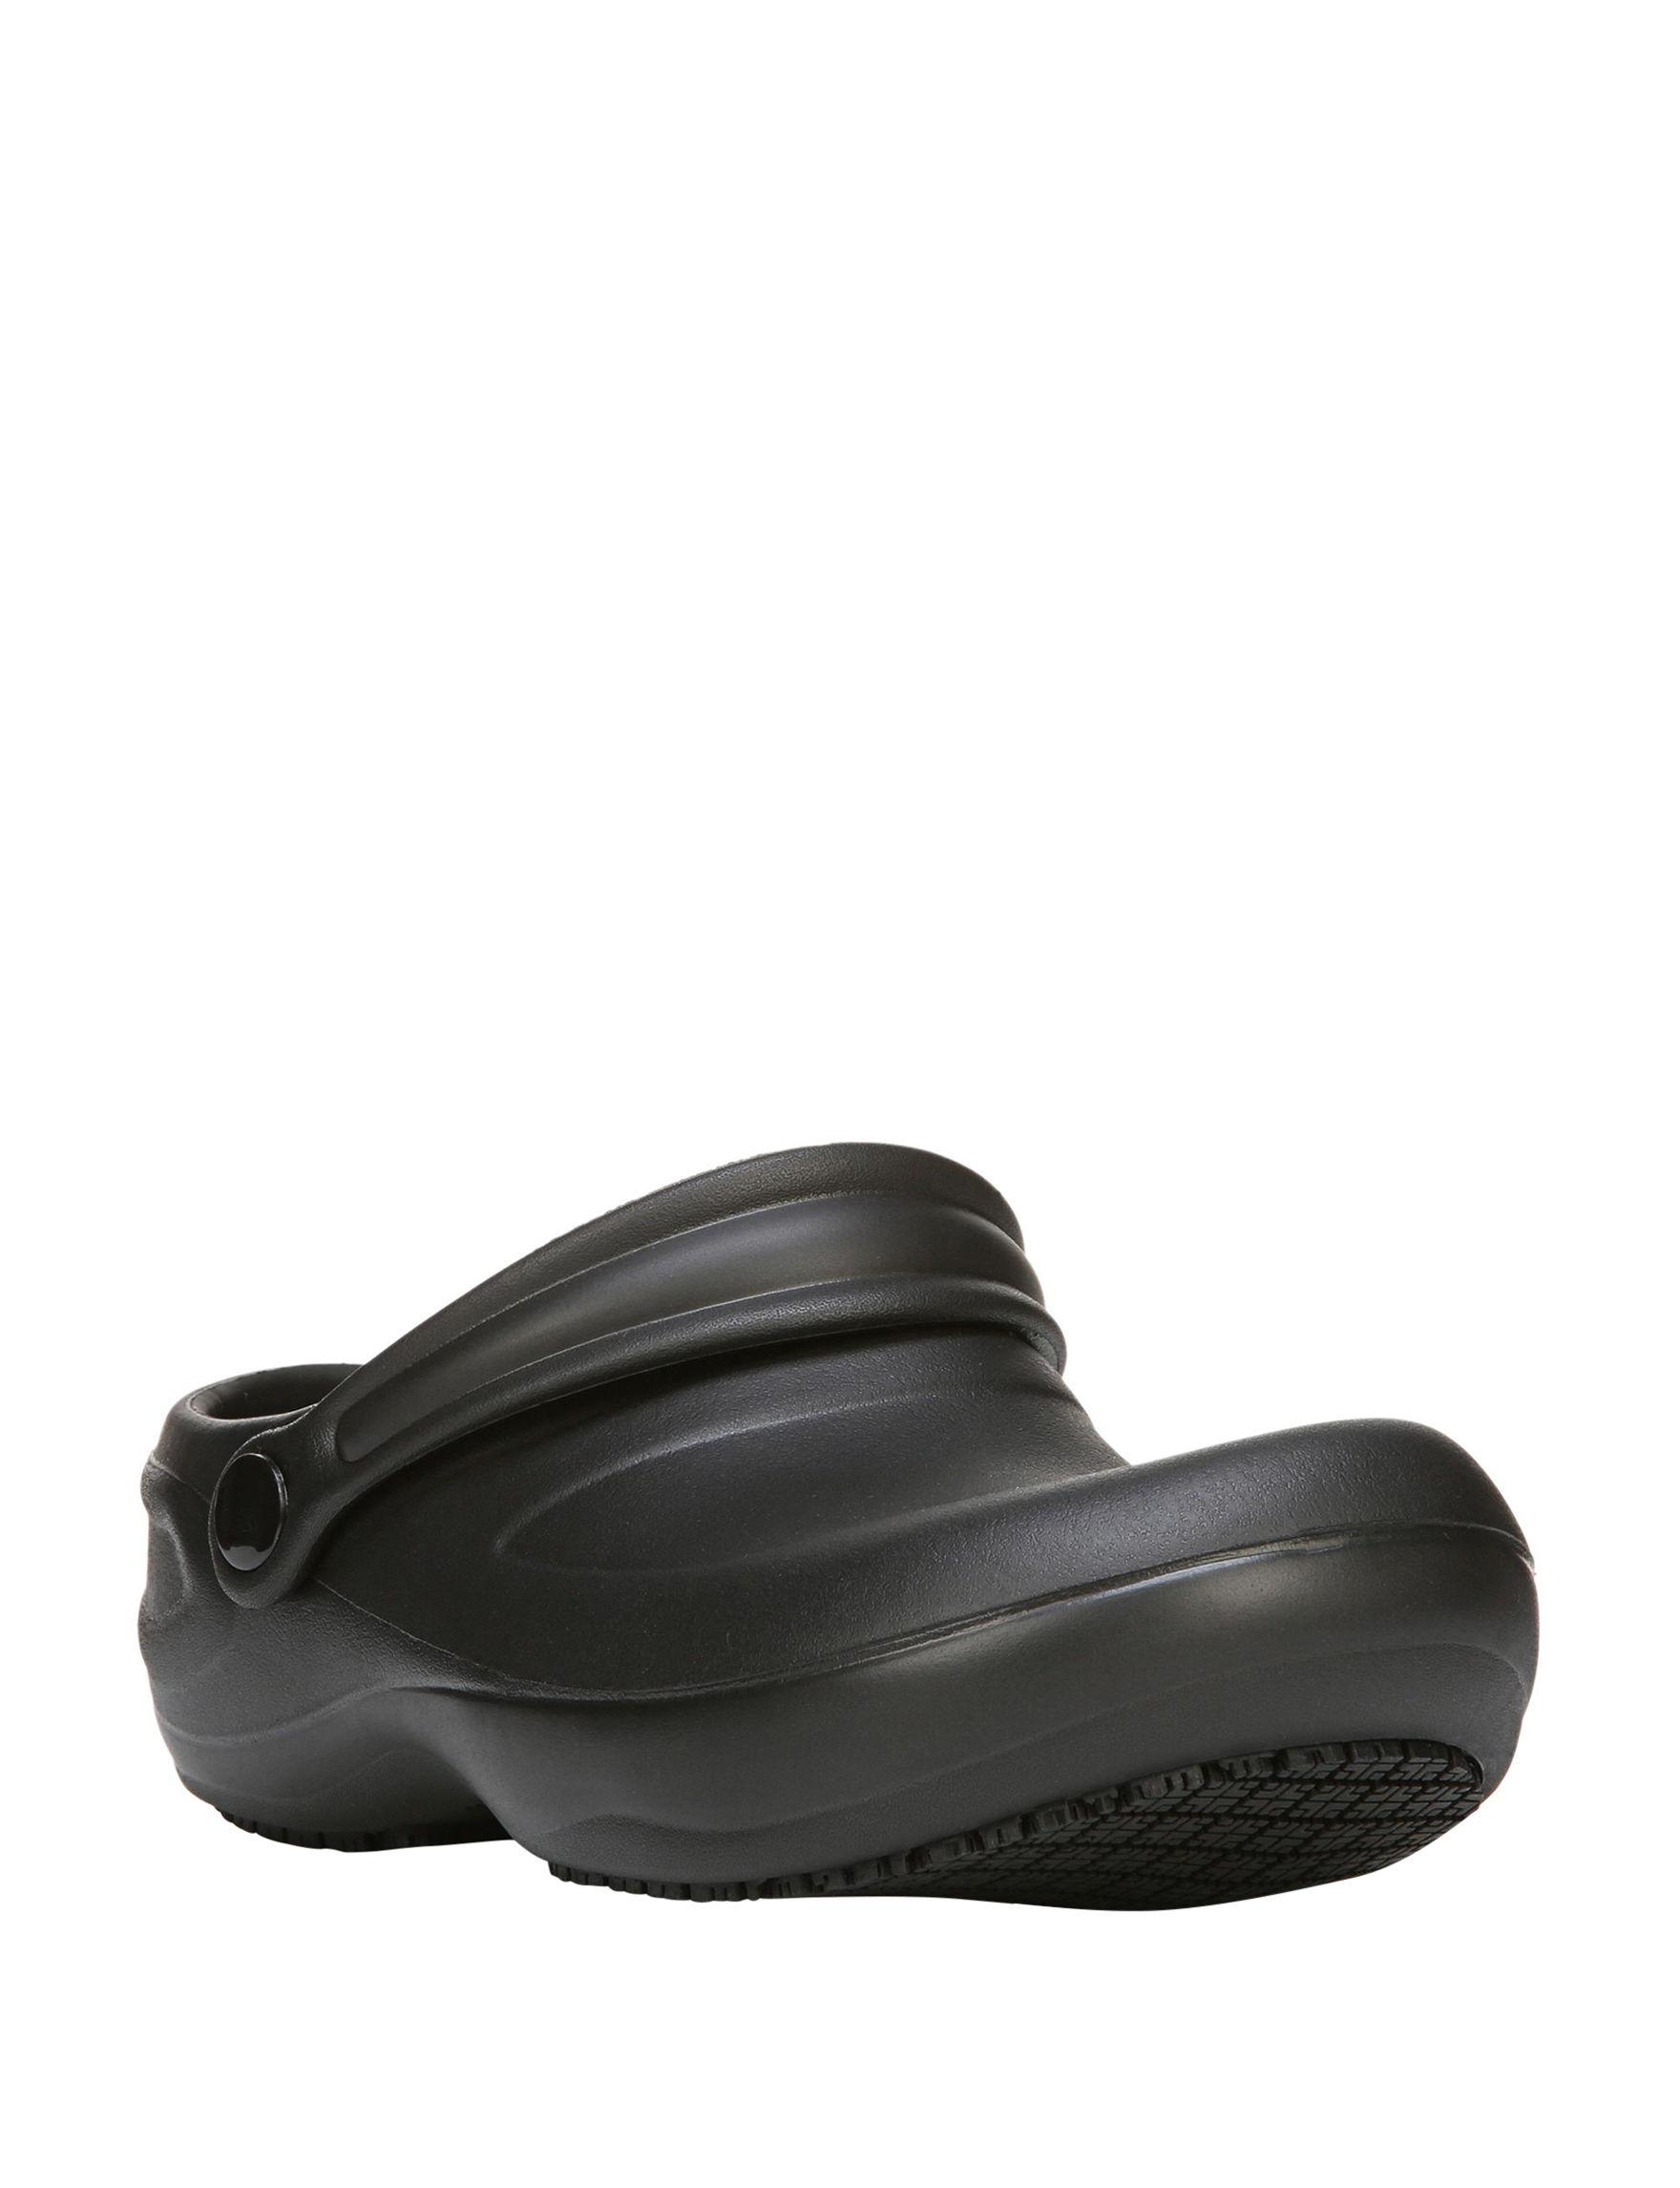 Dr. Scholl's Black Comfort Slip Resistant